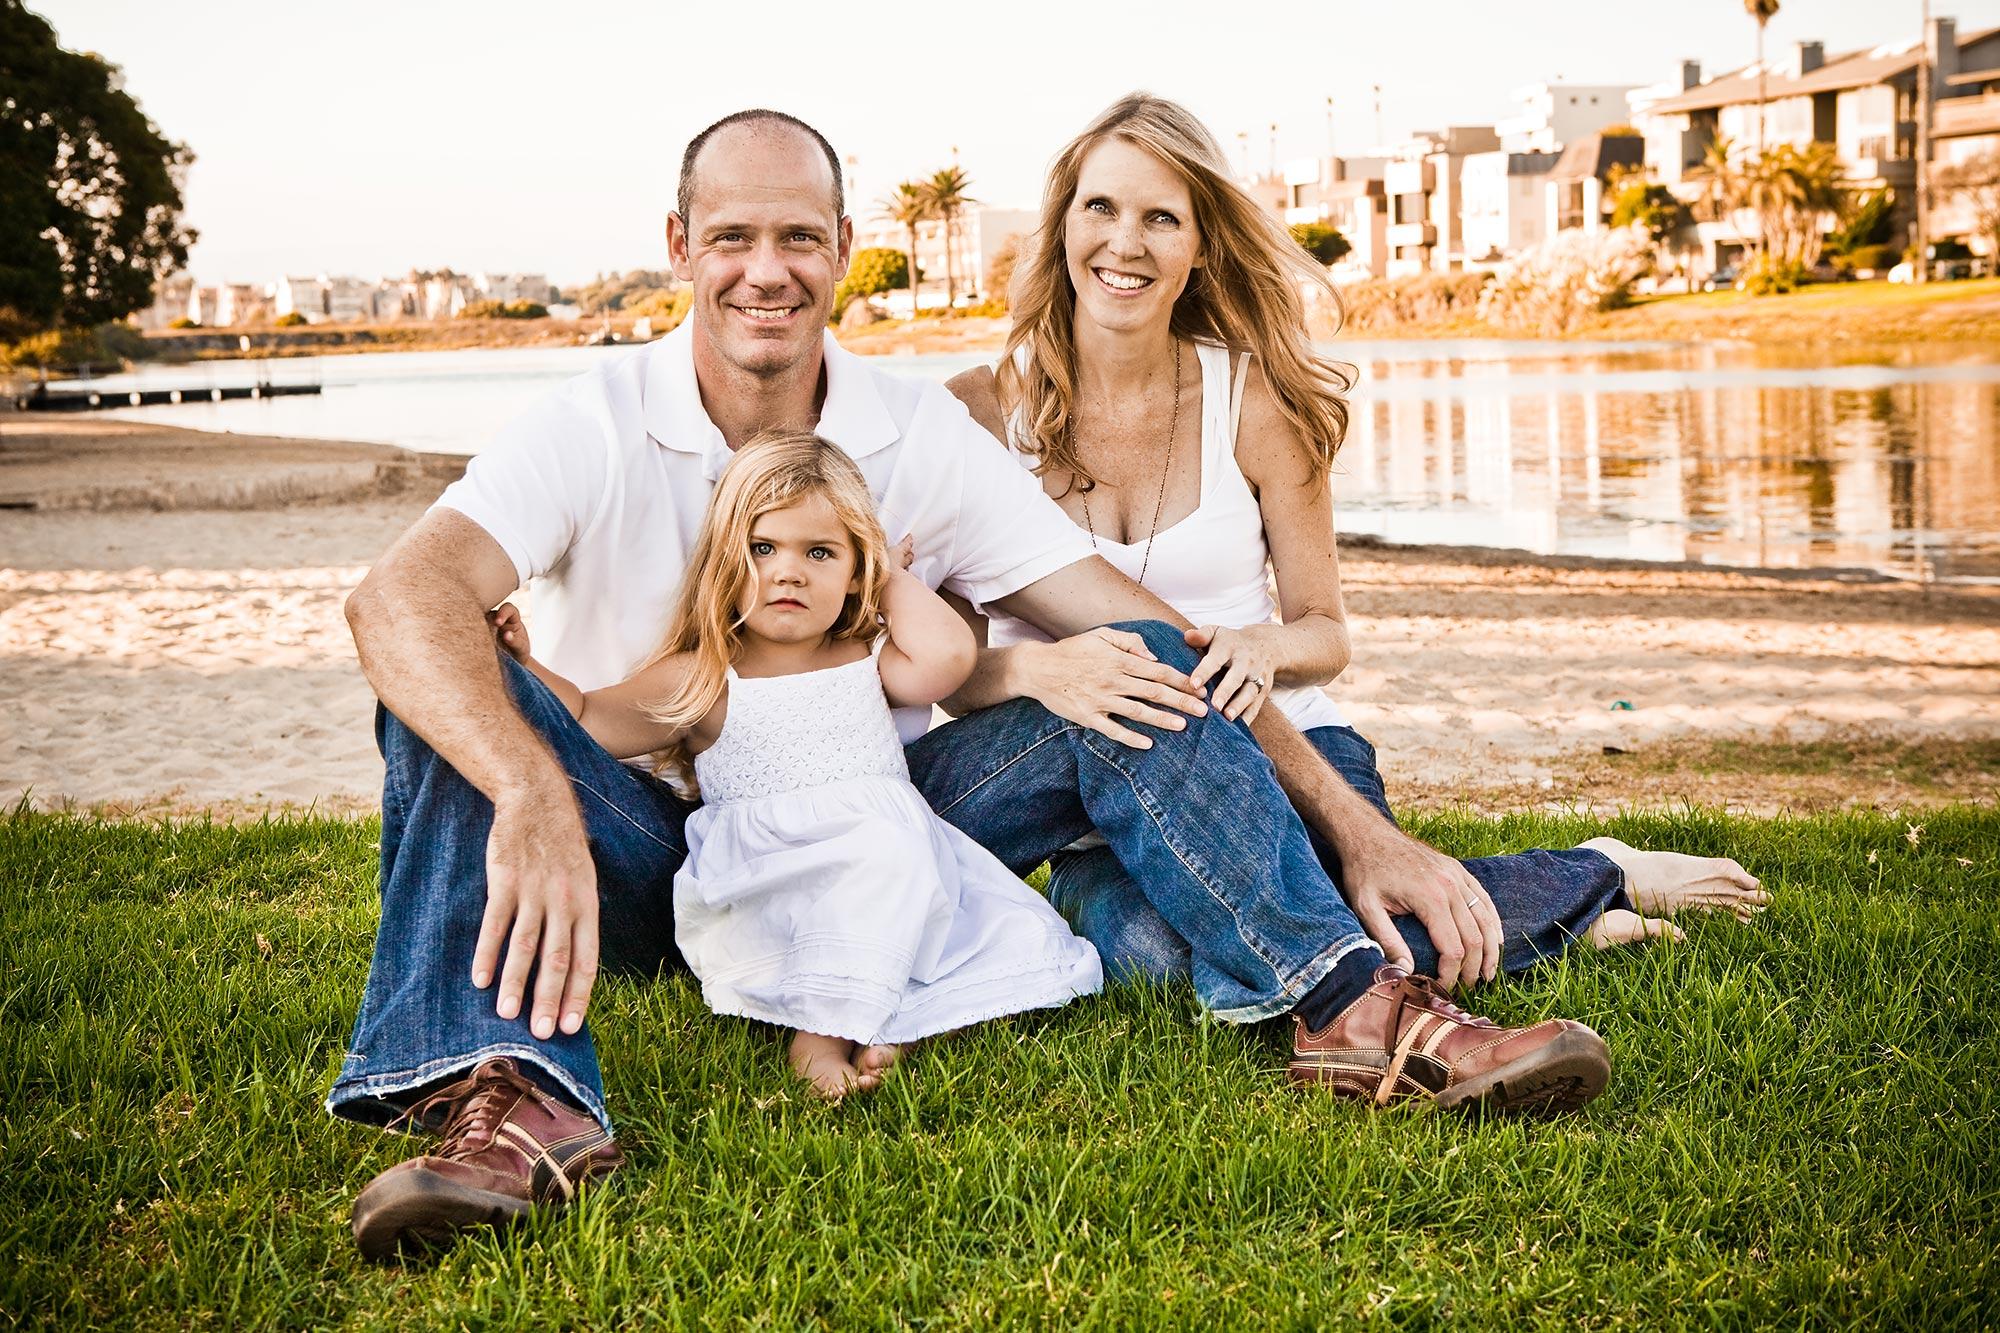 ipswich-bradley-palmer-family-portraits-stephen-grant-photography-015.jpg